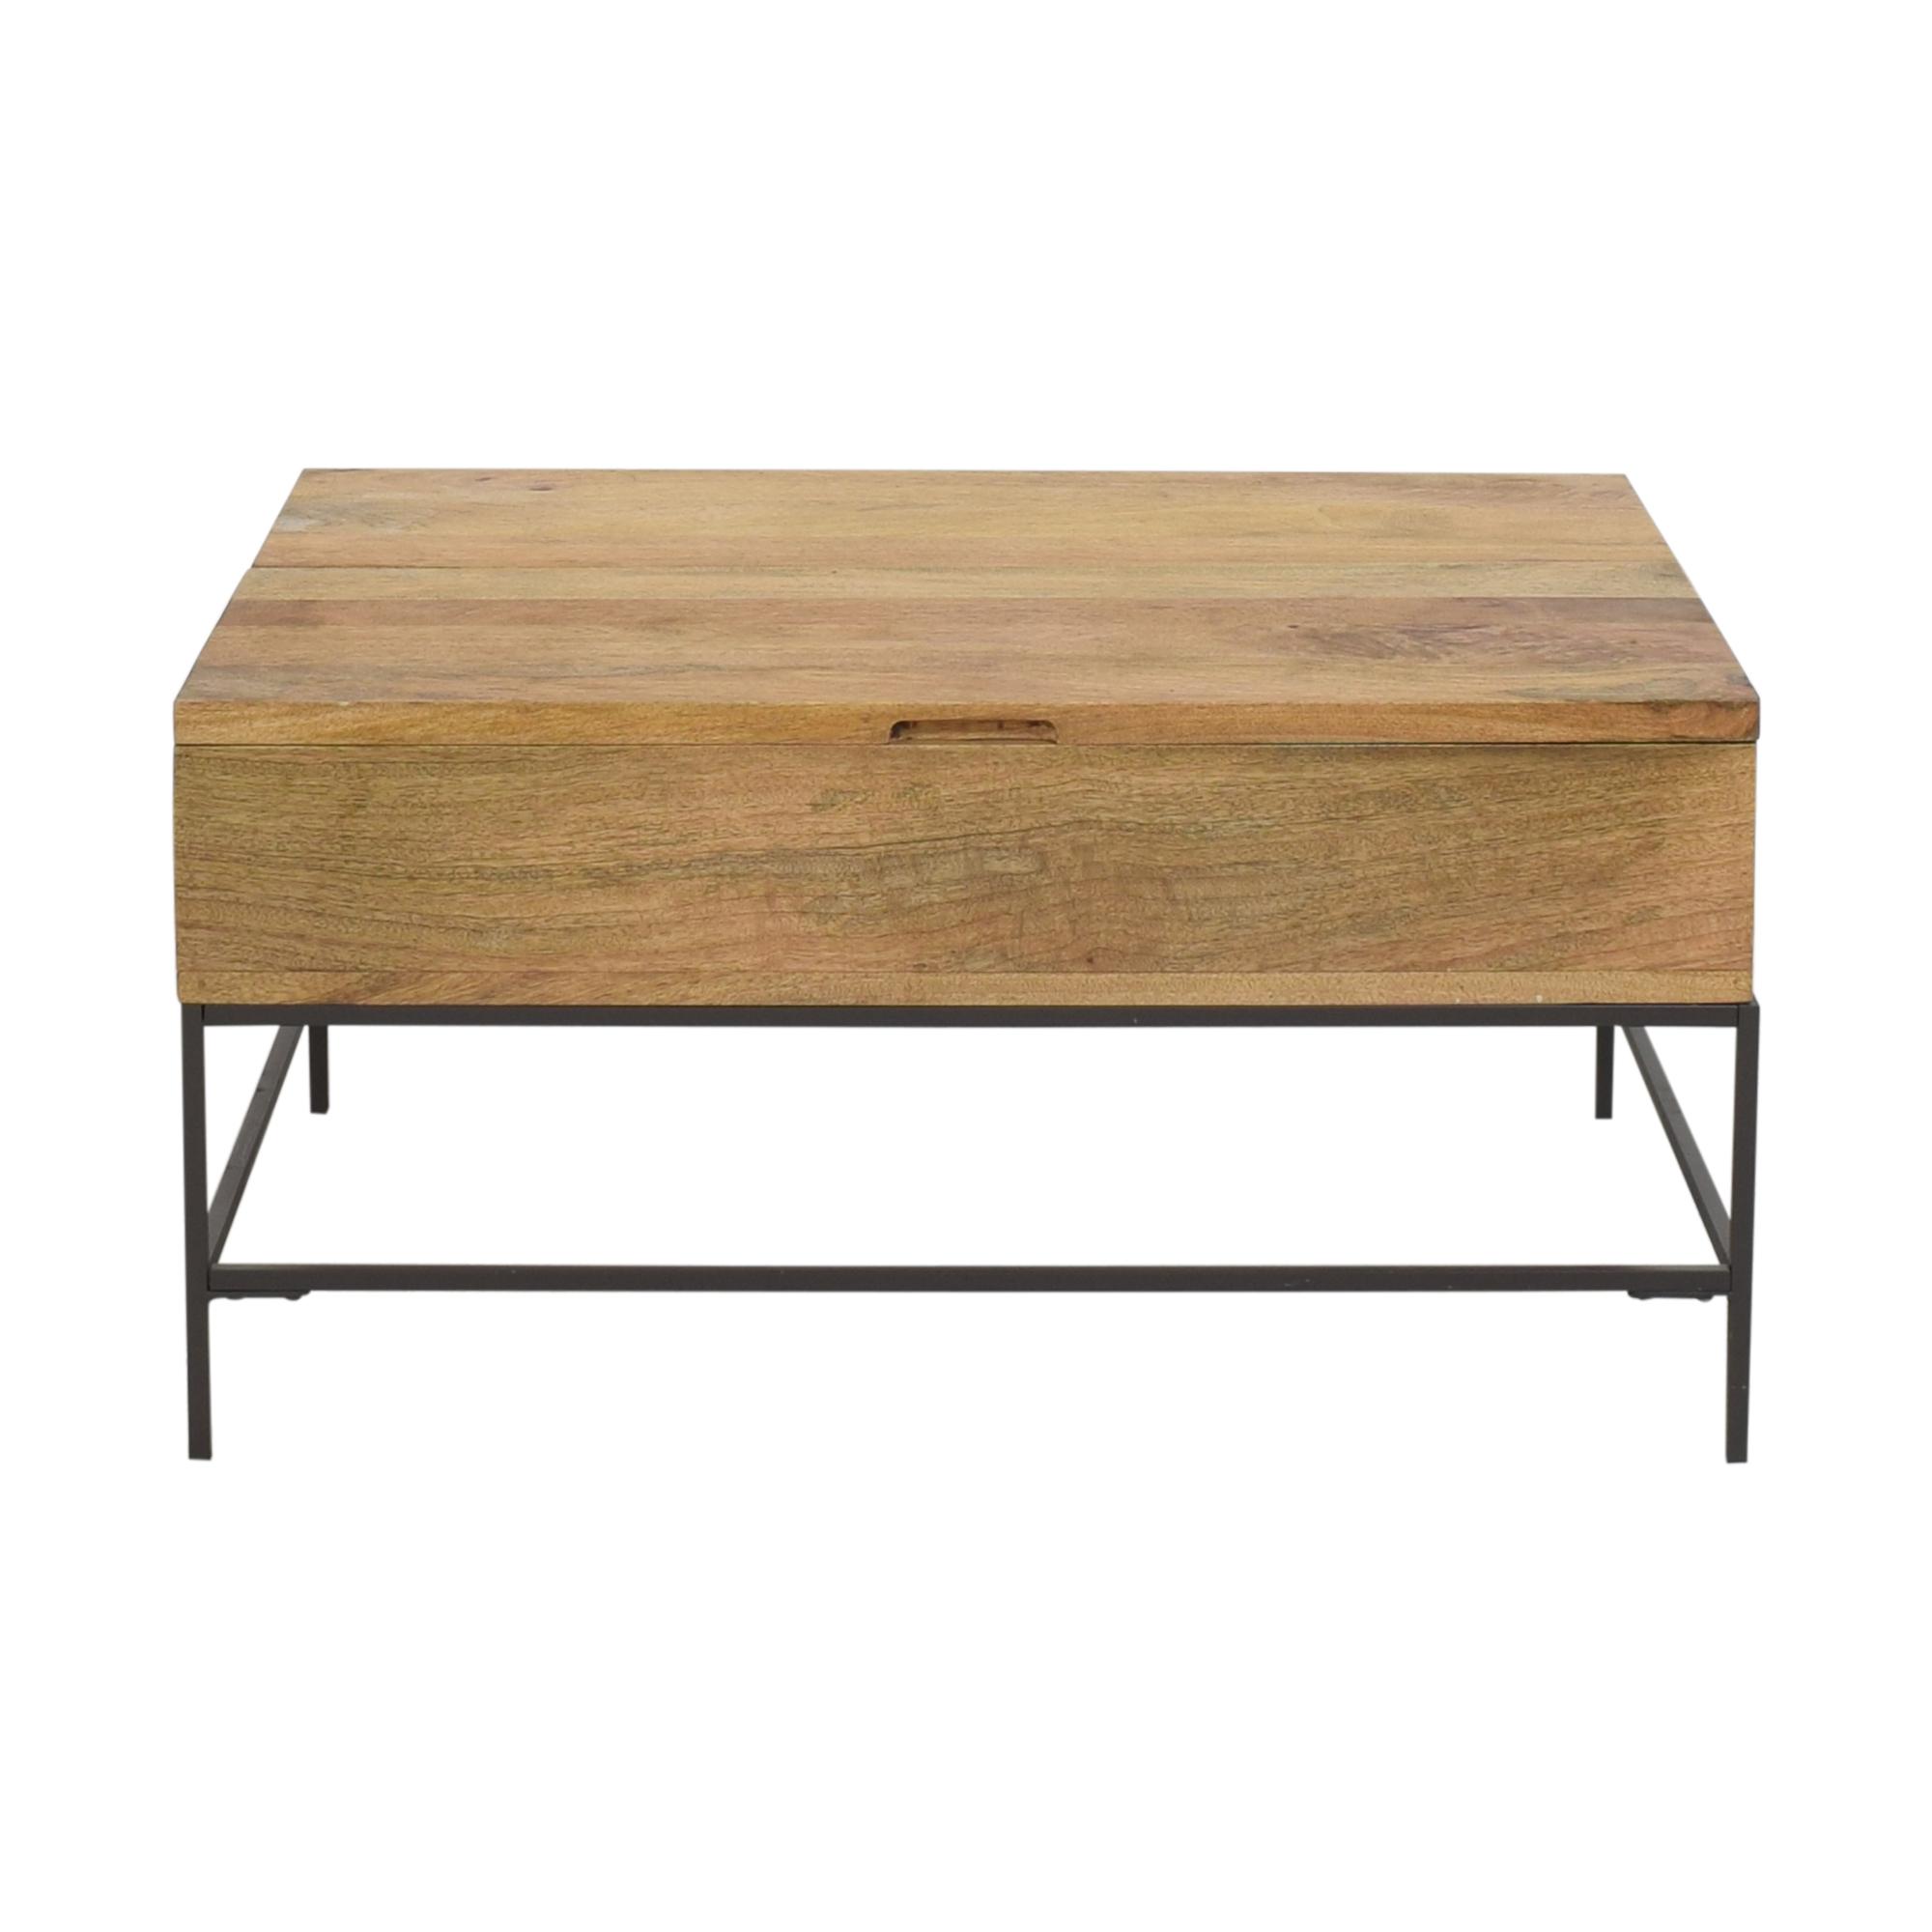 West Elm West Elm Industrial Storage Pop Up Coffee Table on sale